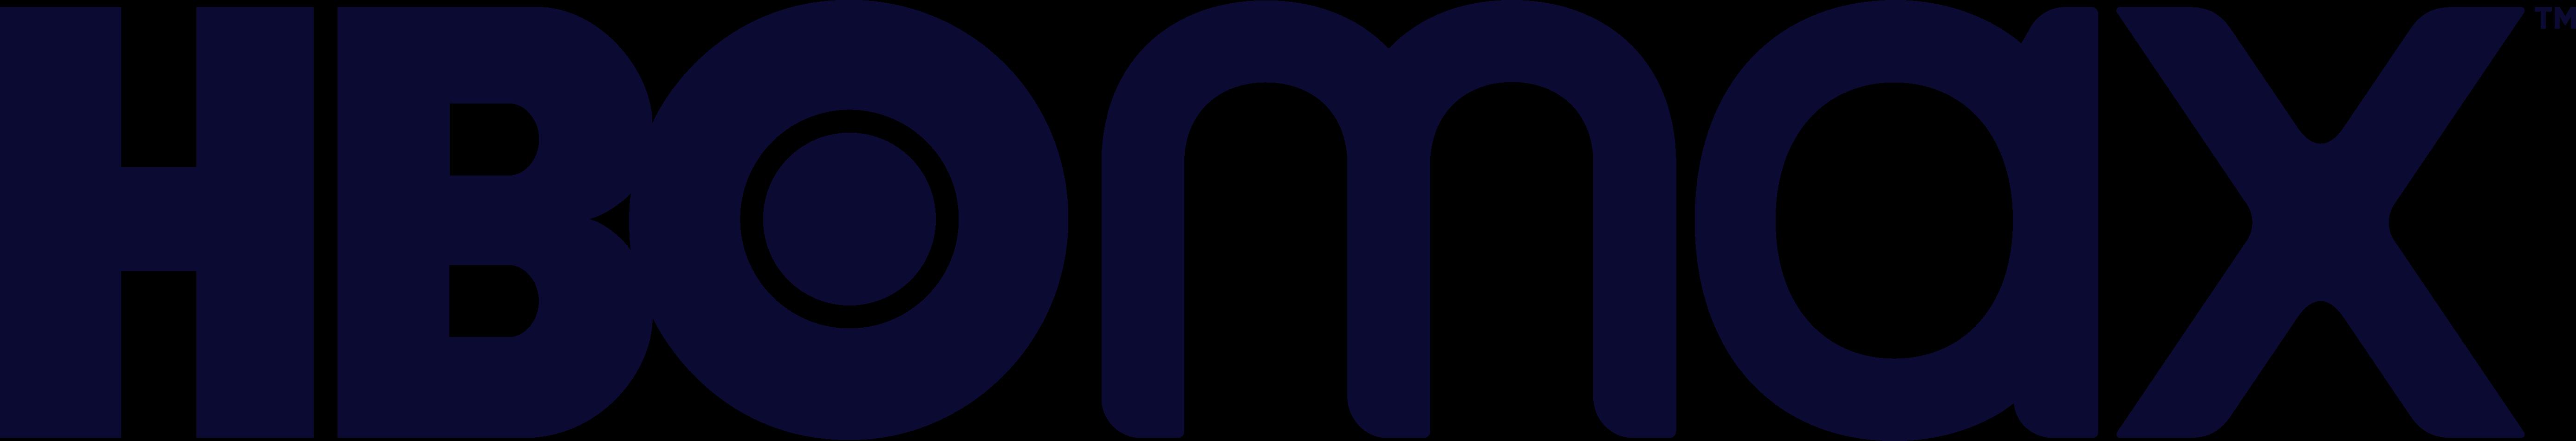 HBO Max Channel | Premium Channel | DISH Satellite TV